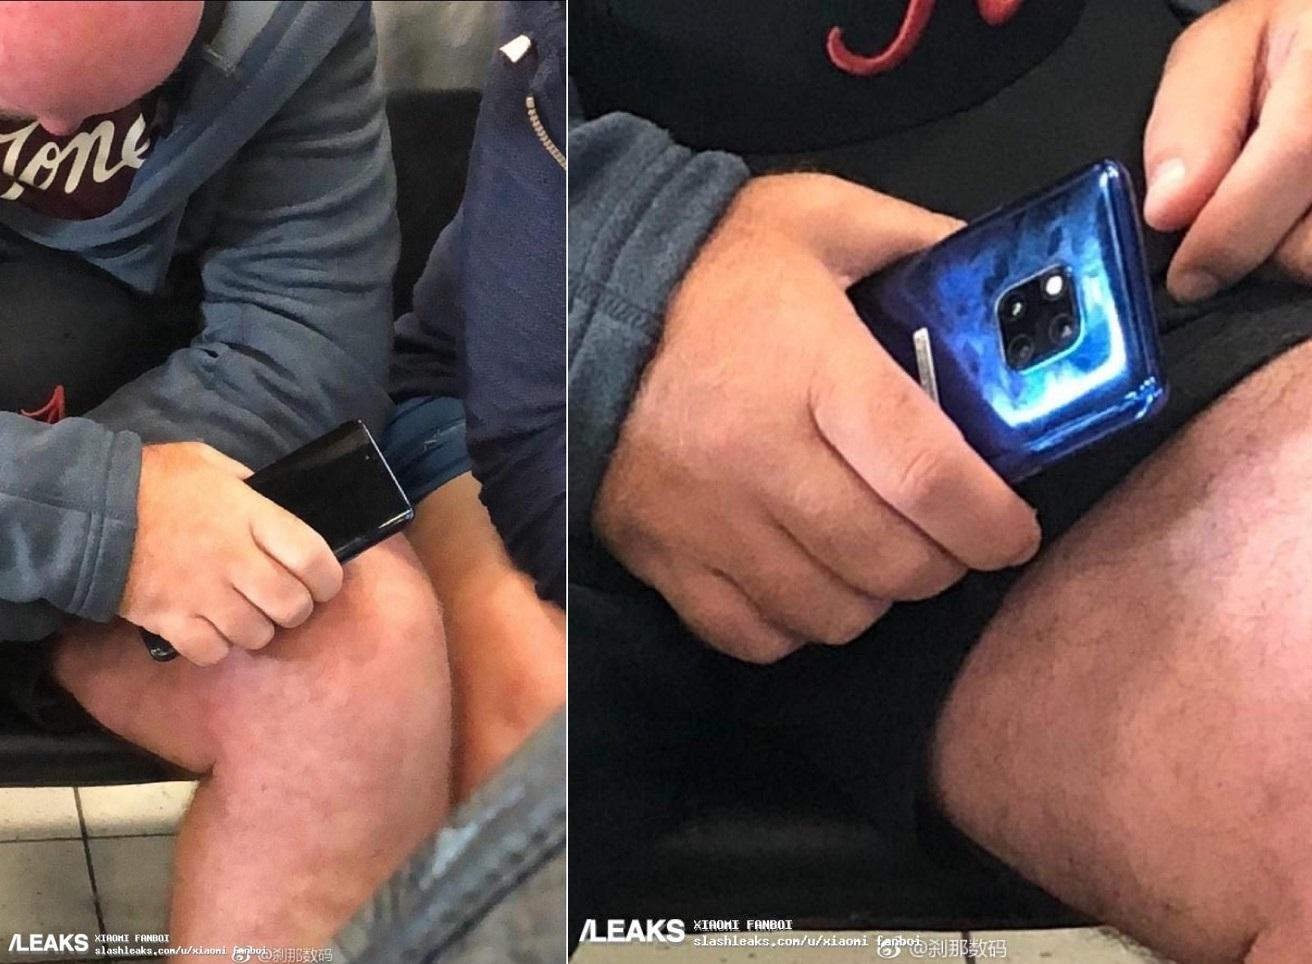 Le futur Huawei Mate 20 Pro aperçu dans un métro